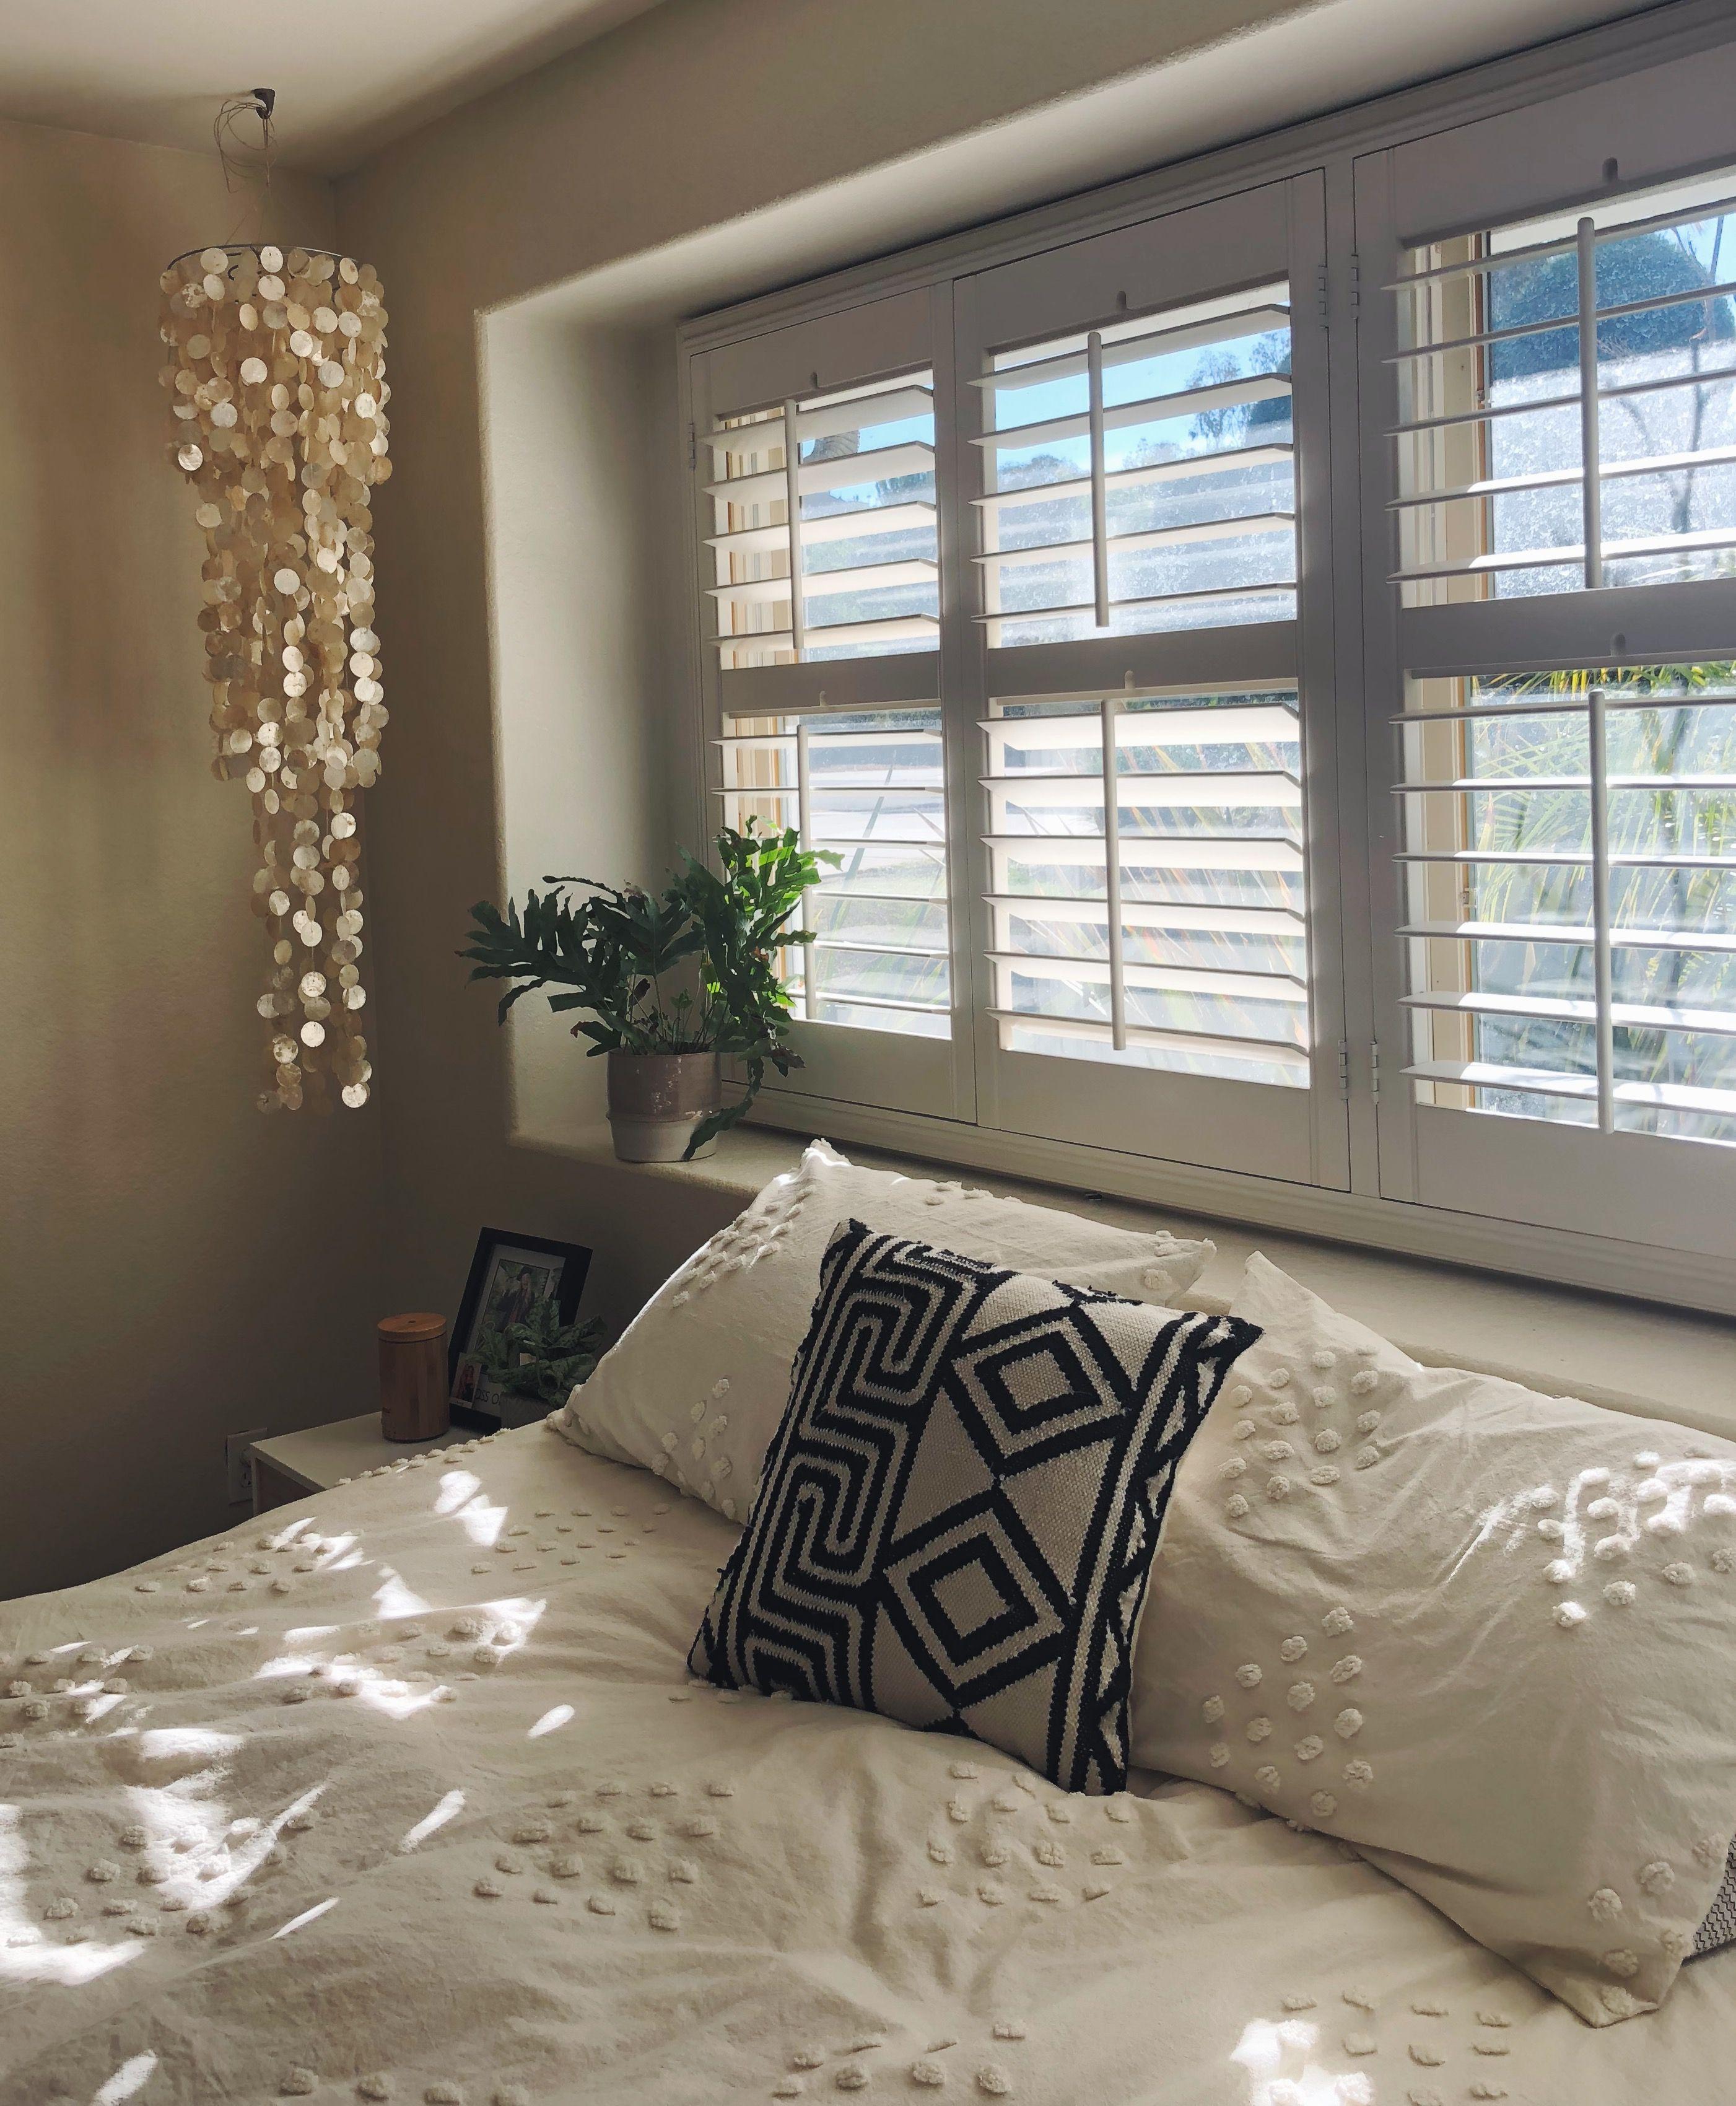 Boho bedroom | Bedroom inspirations, House rooms, Room inspo